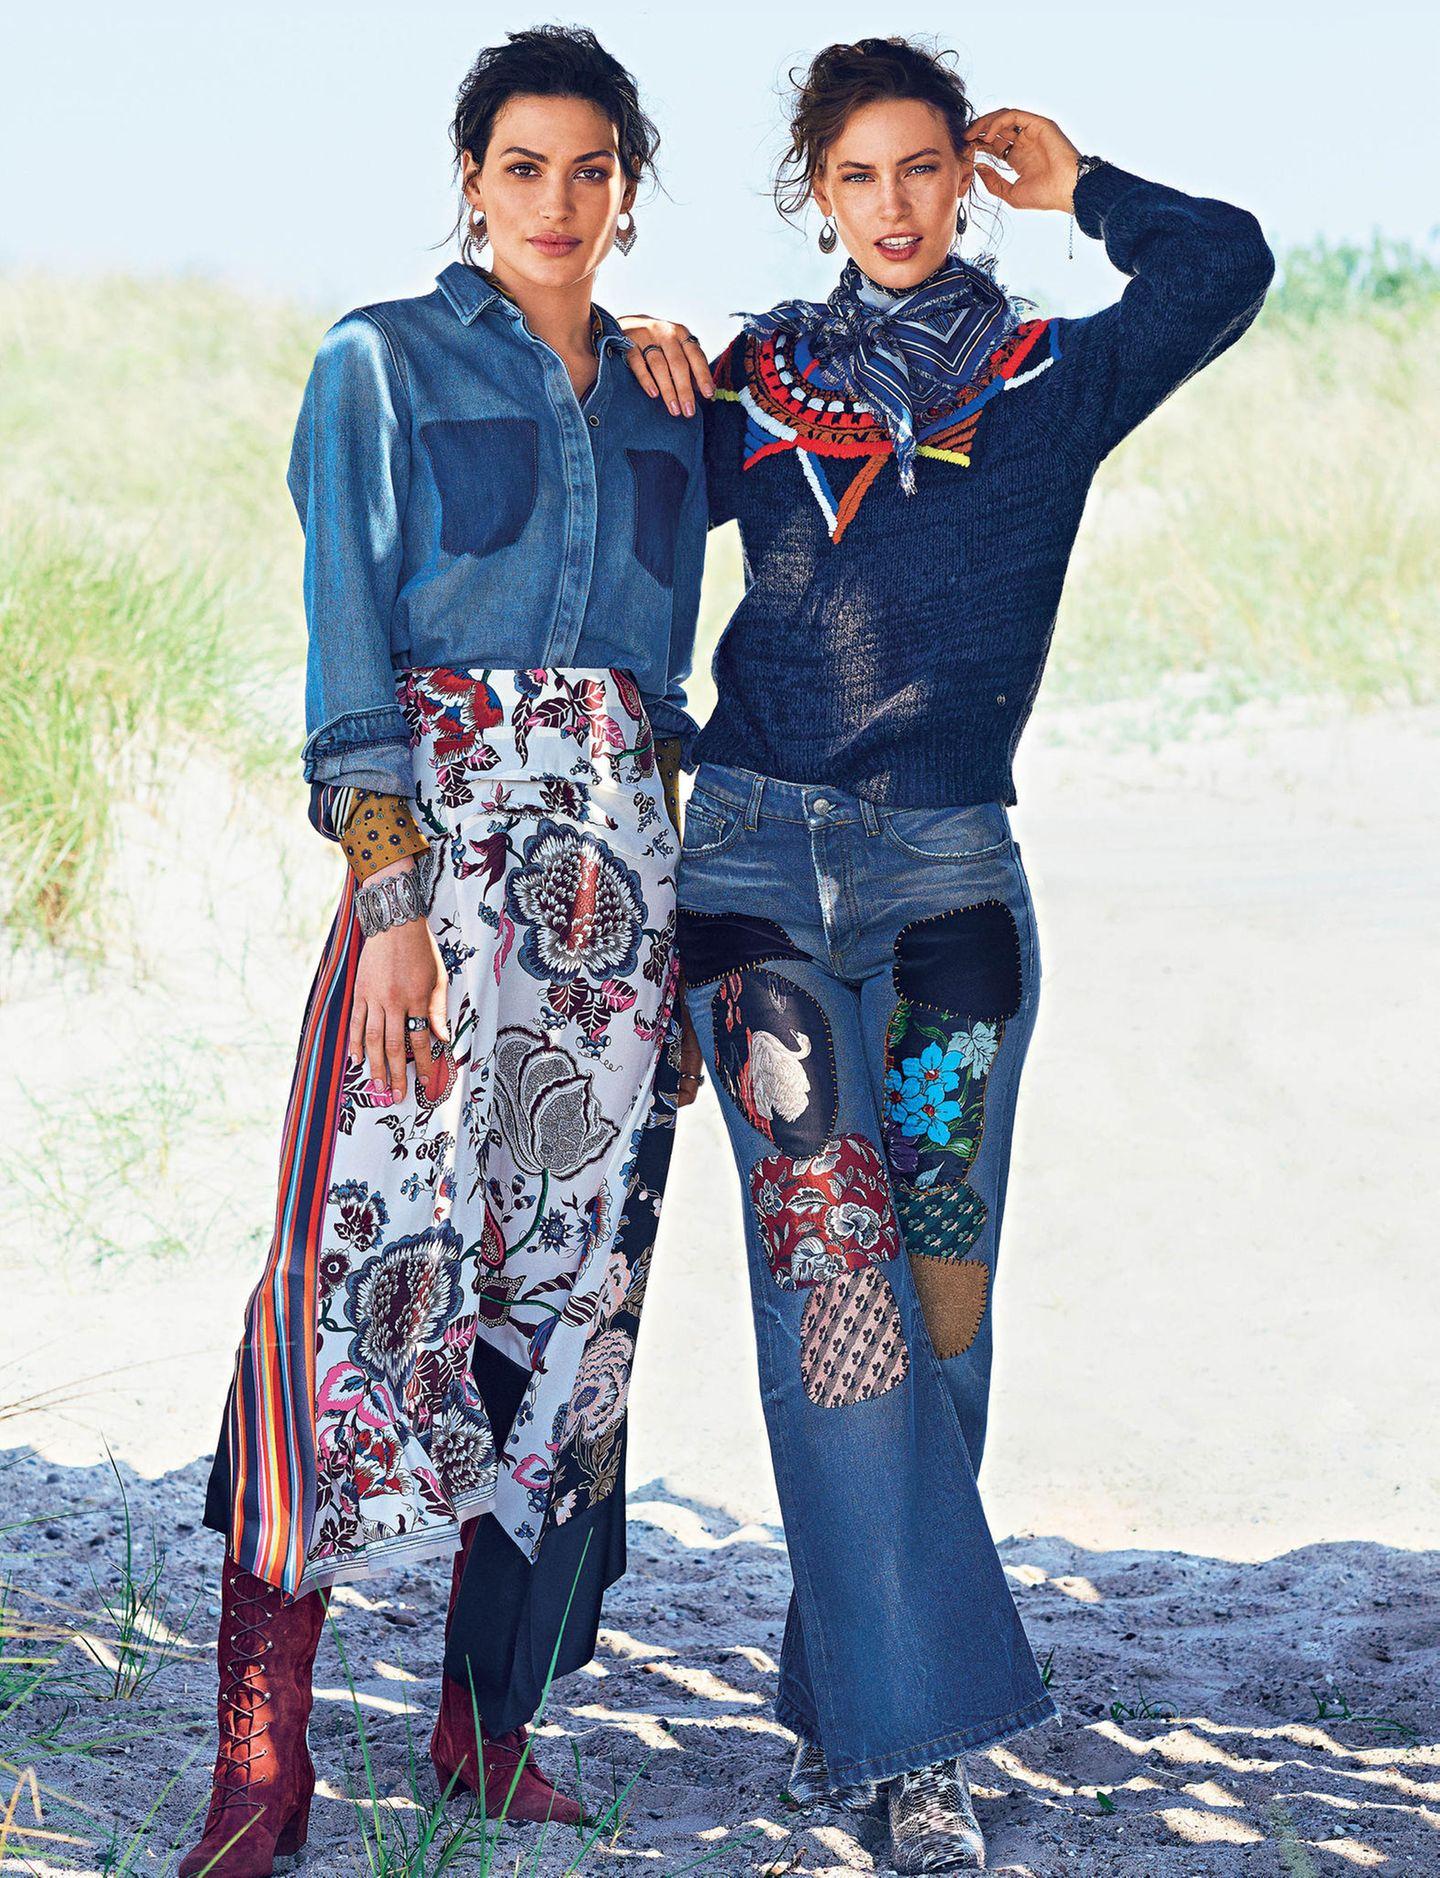 Frauen im Western-Style